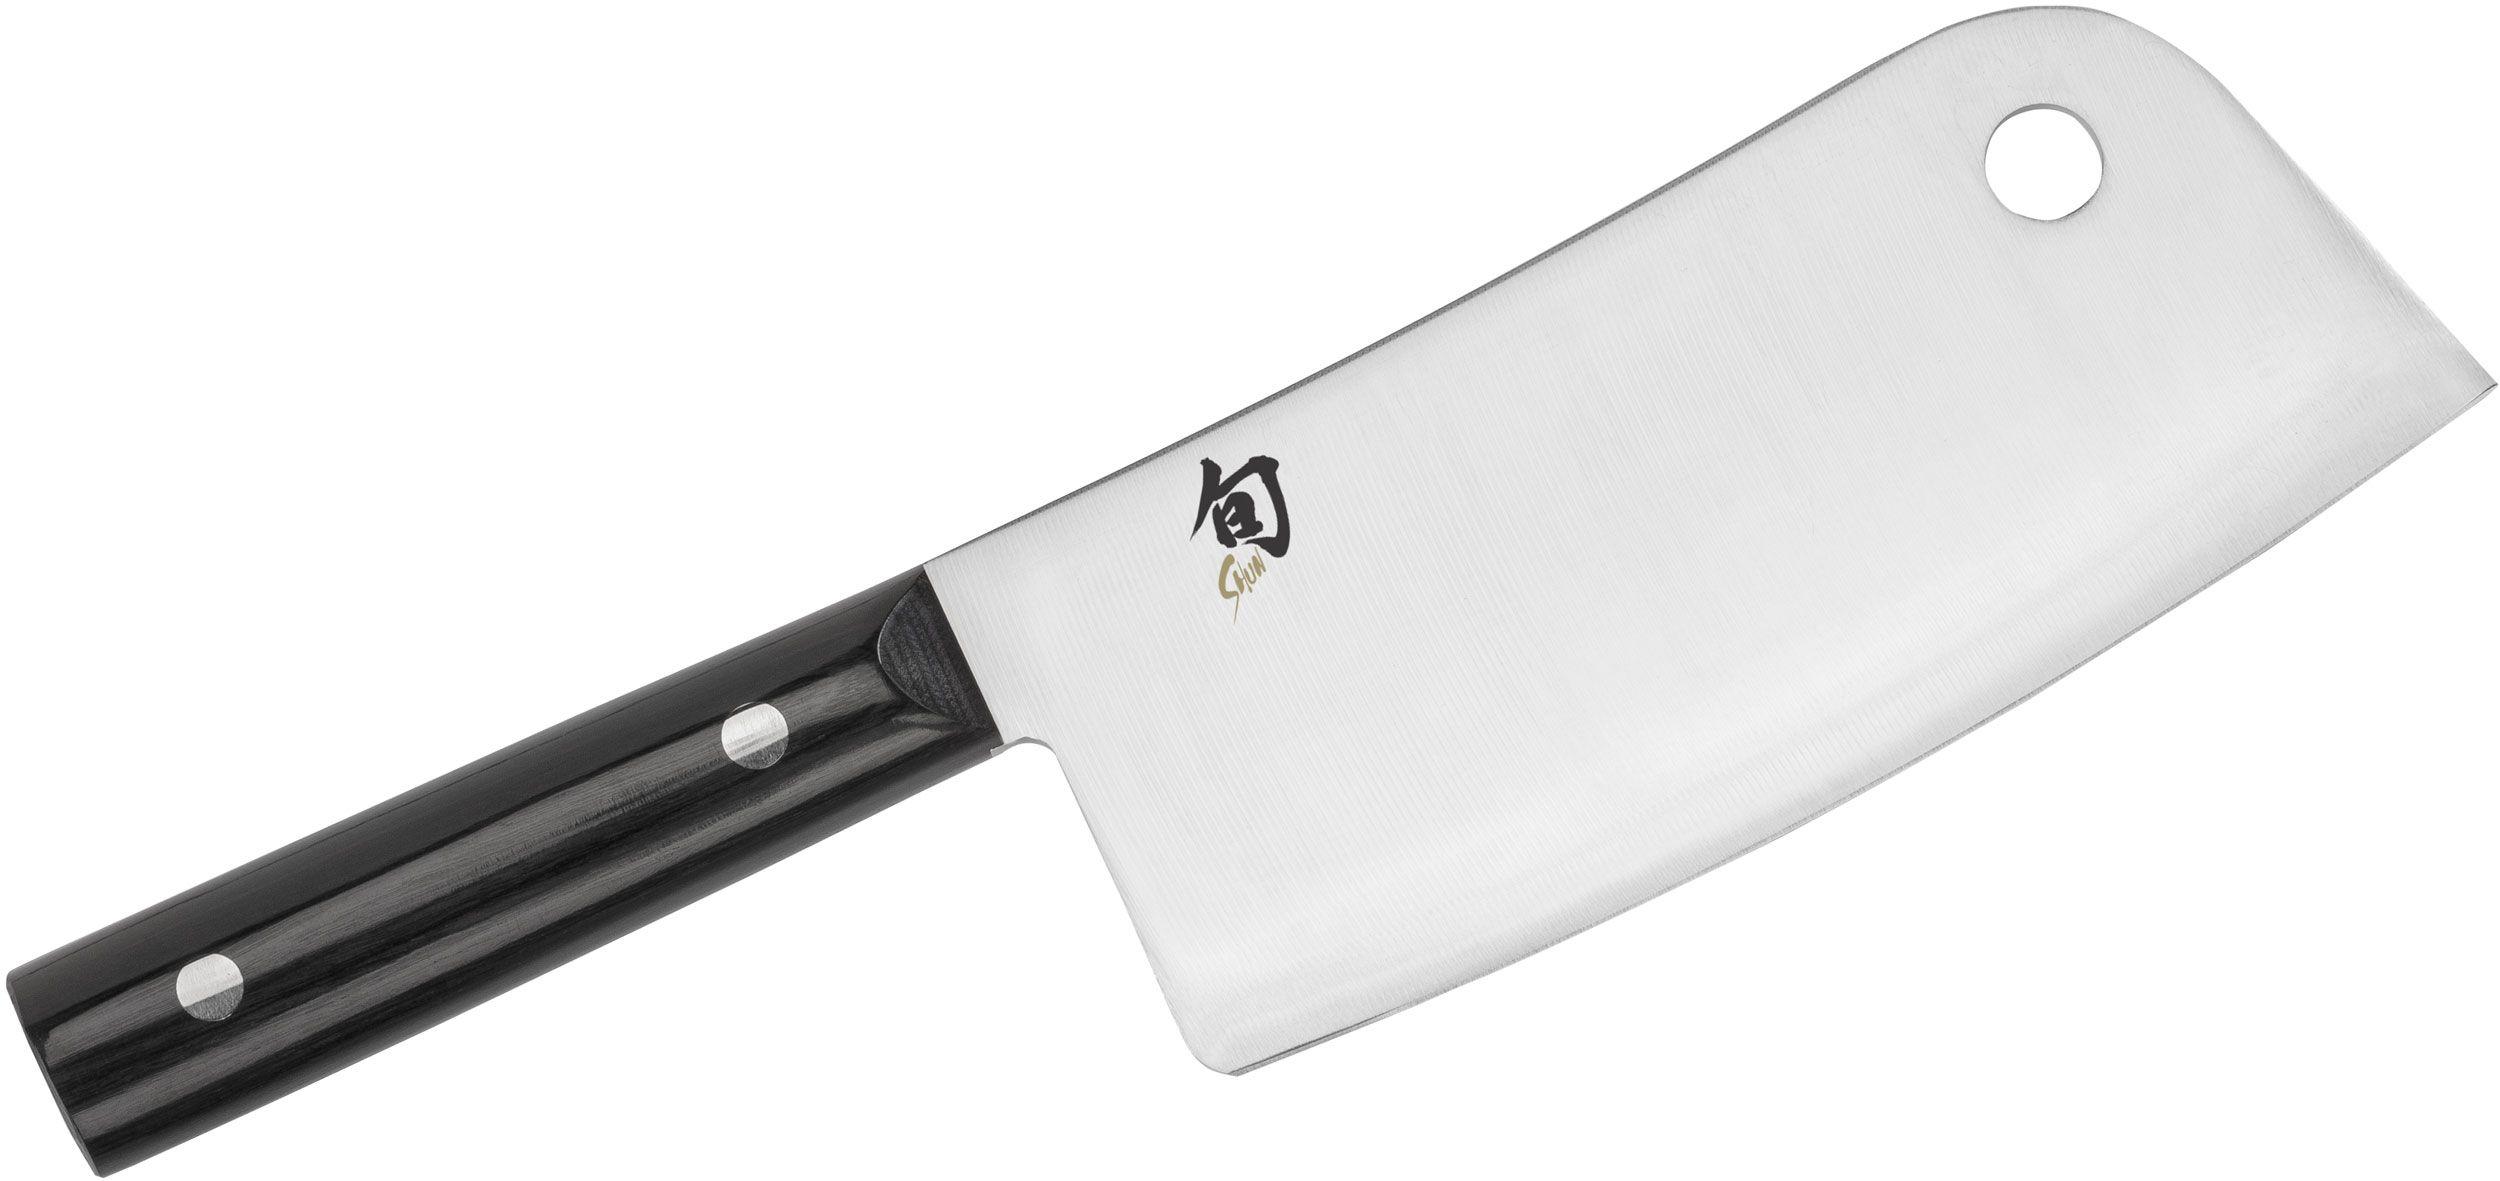 Shun DM0767 Classic Meat Cleaver 6 inch Blade, Pakkawood Handles